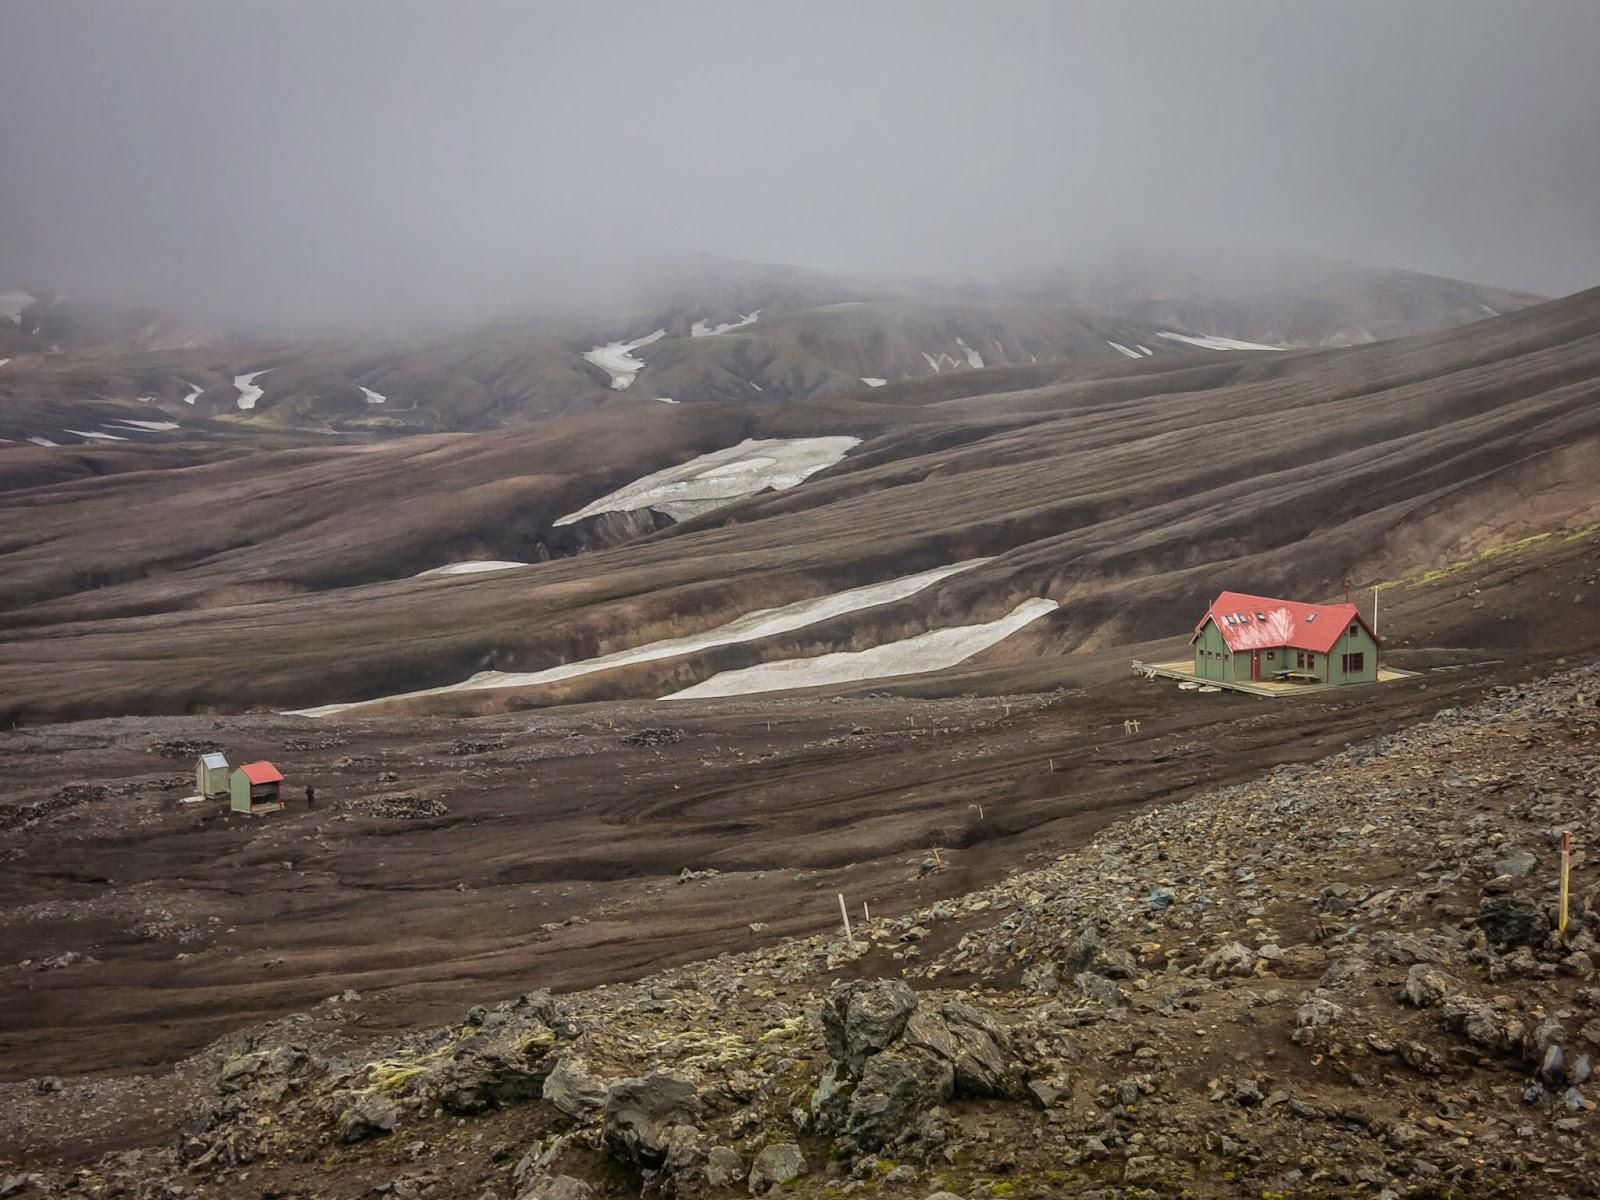 Diario de Viaje en Islandia